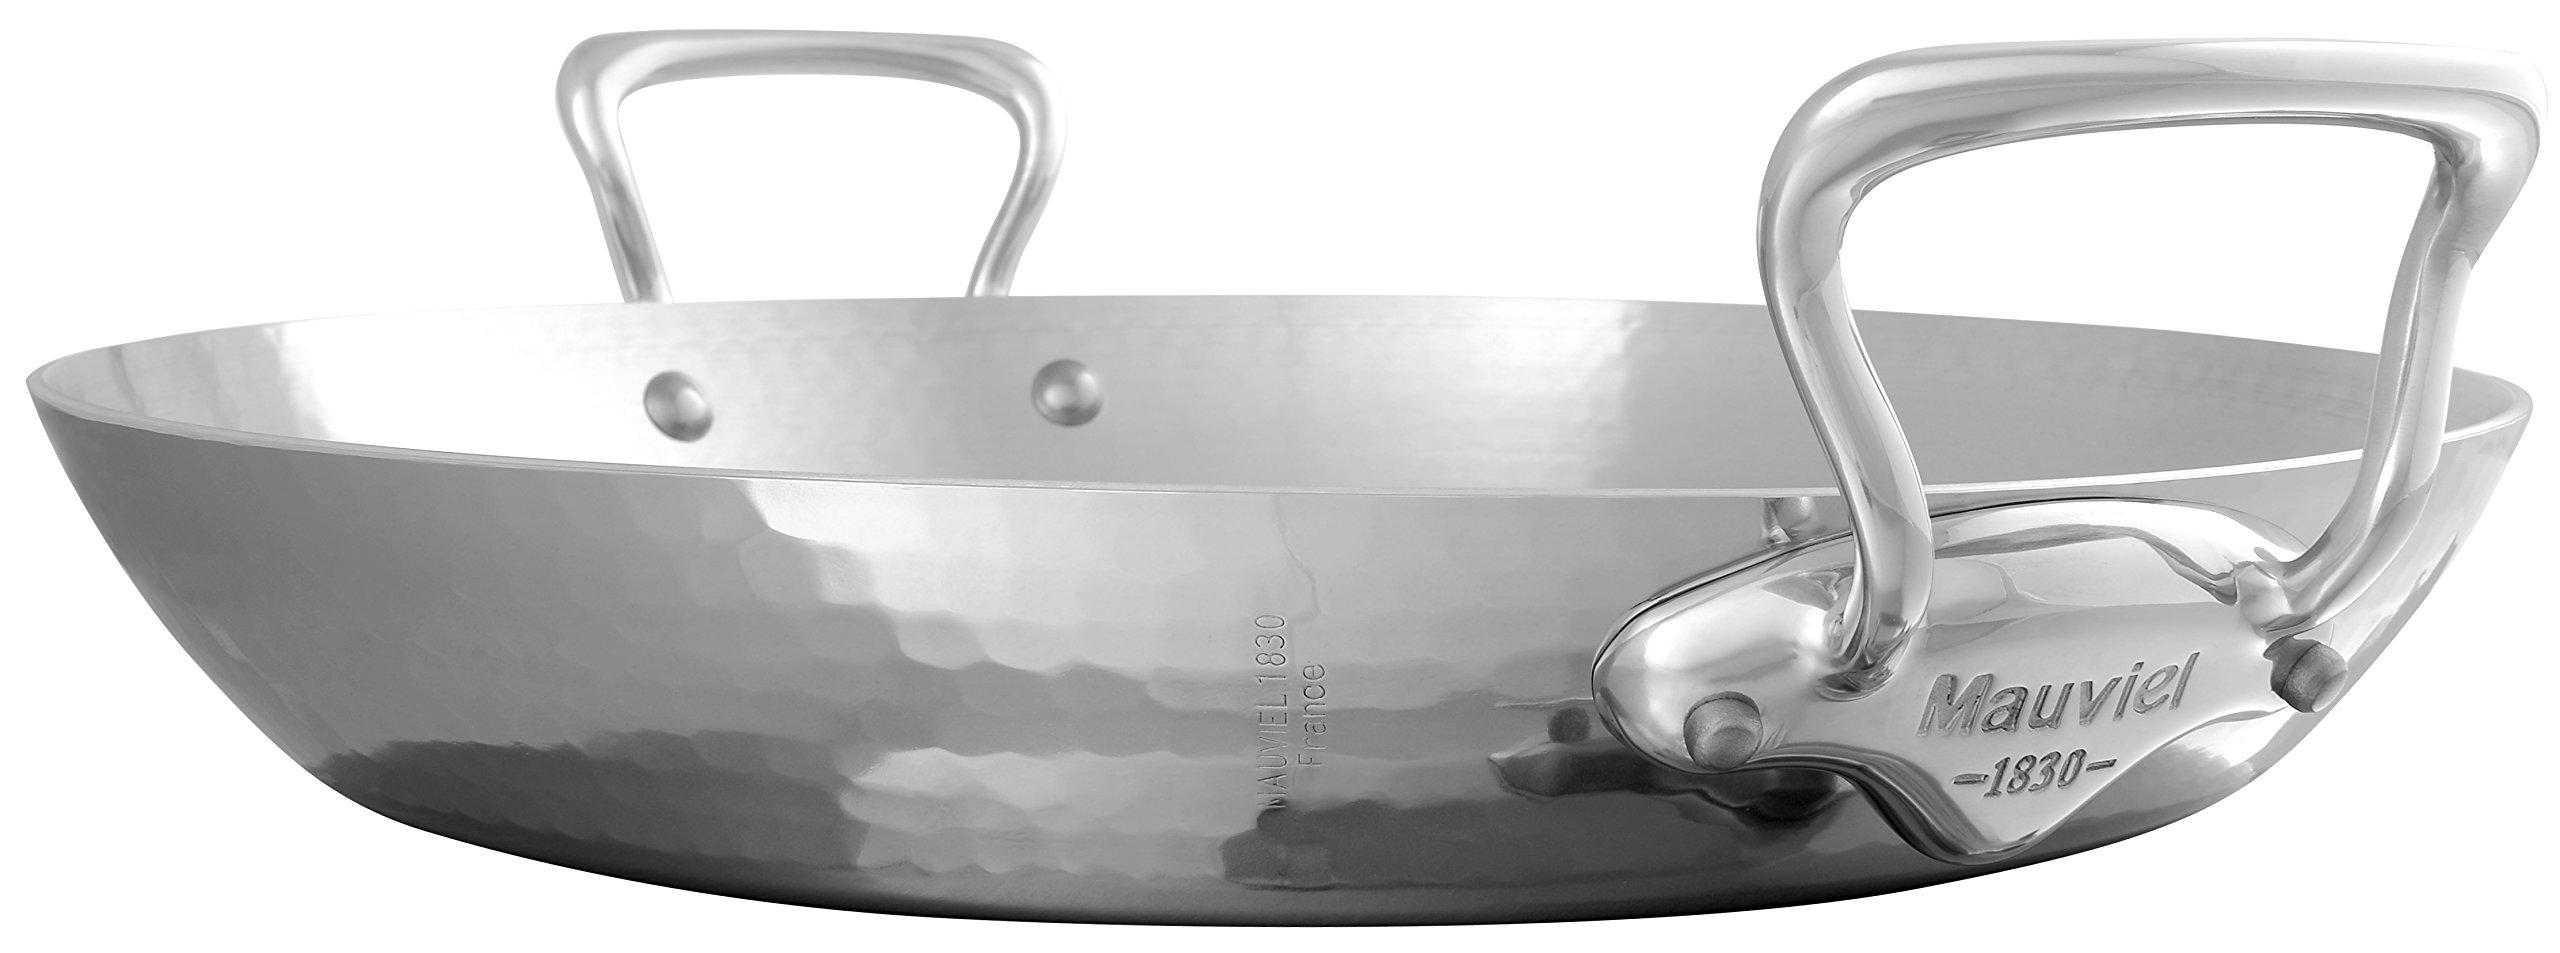 Mauviel 5277.35 M'Elite Paella pan, 13.8 Stainless